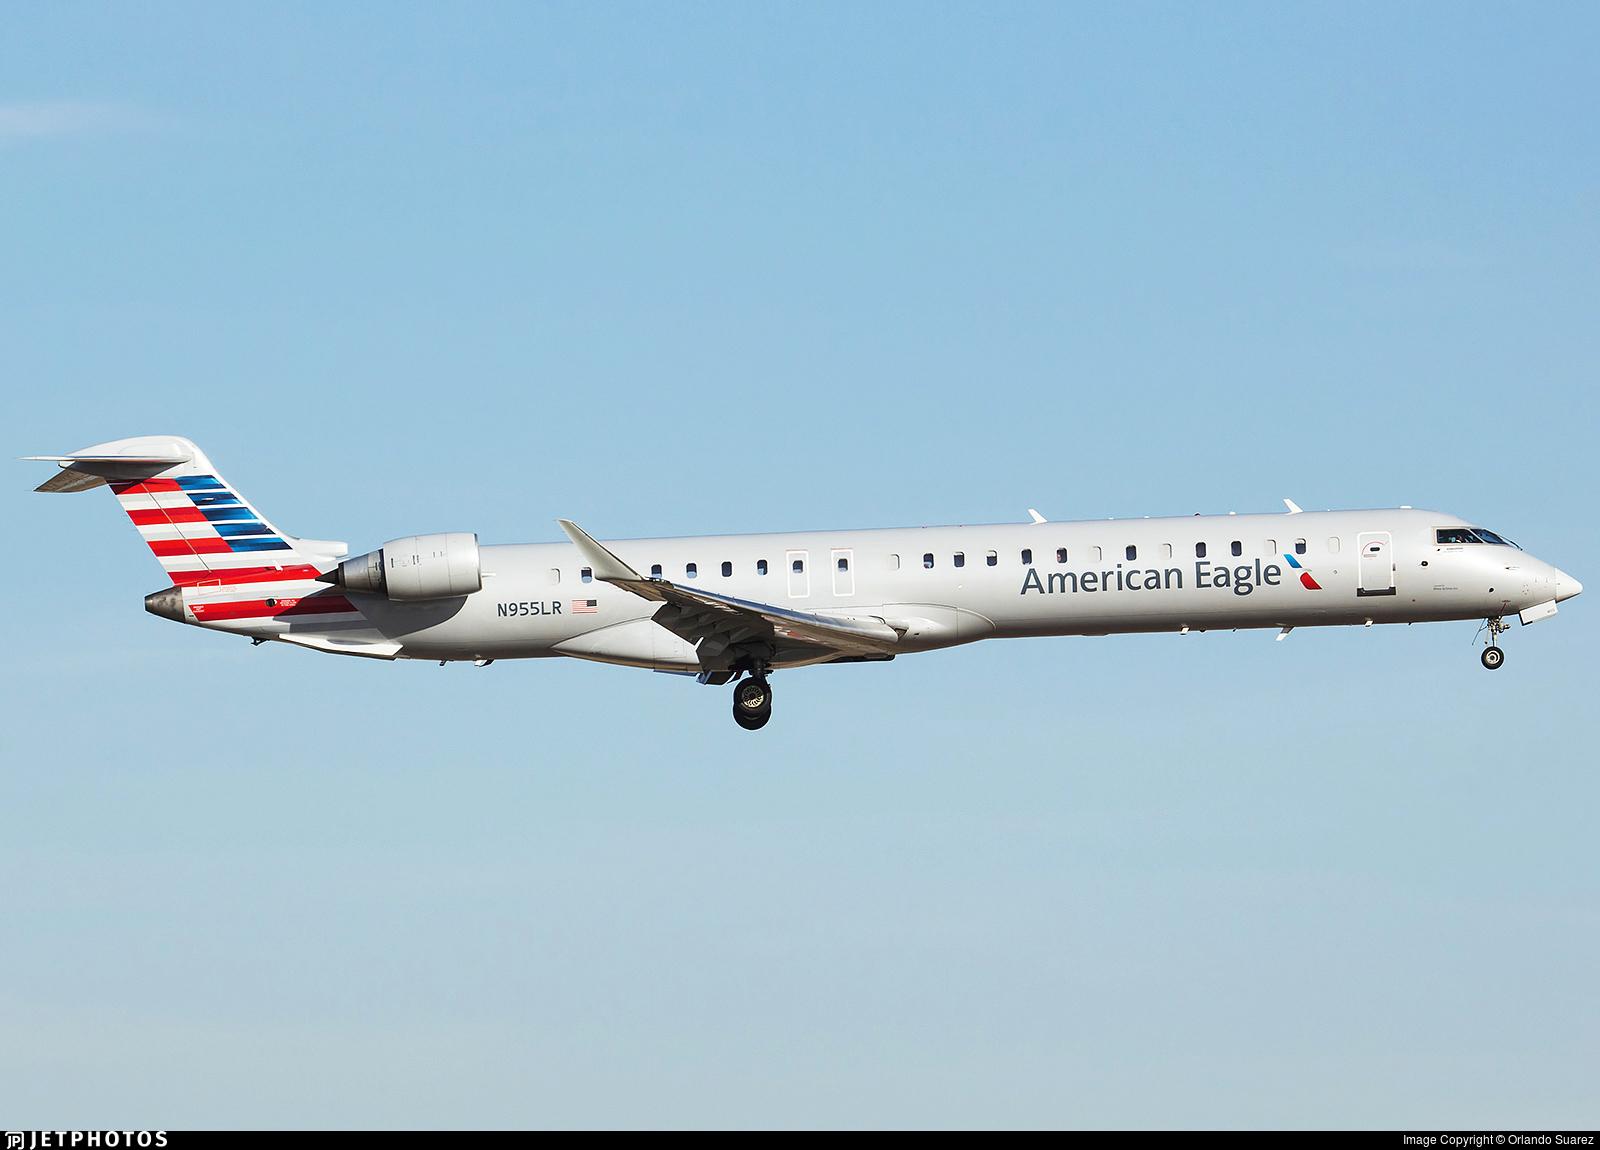 N955LR | Bombardier CRJ-900LR | American Eagle (Mesa Airlines) | Orlando  Suarez | JetPhotos